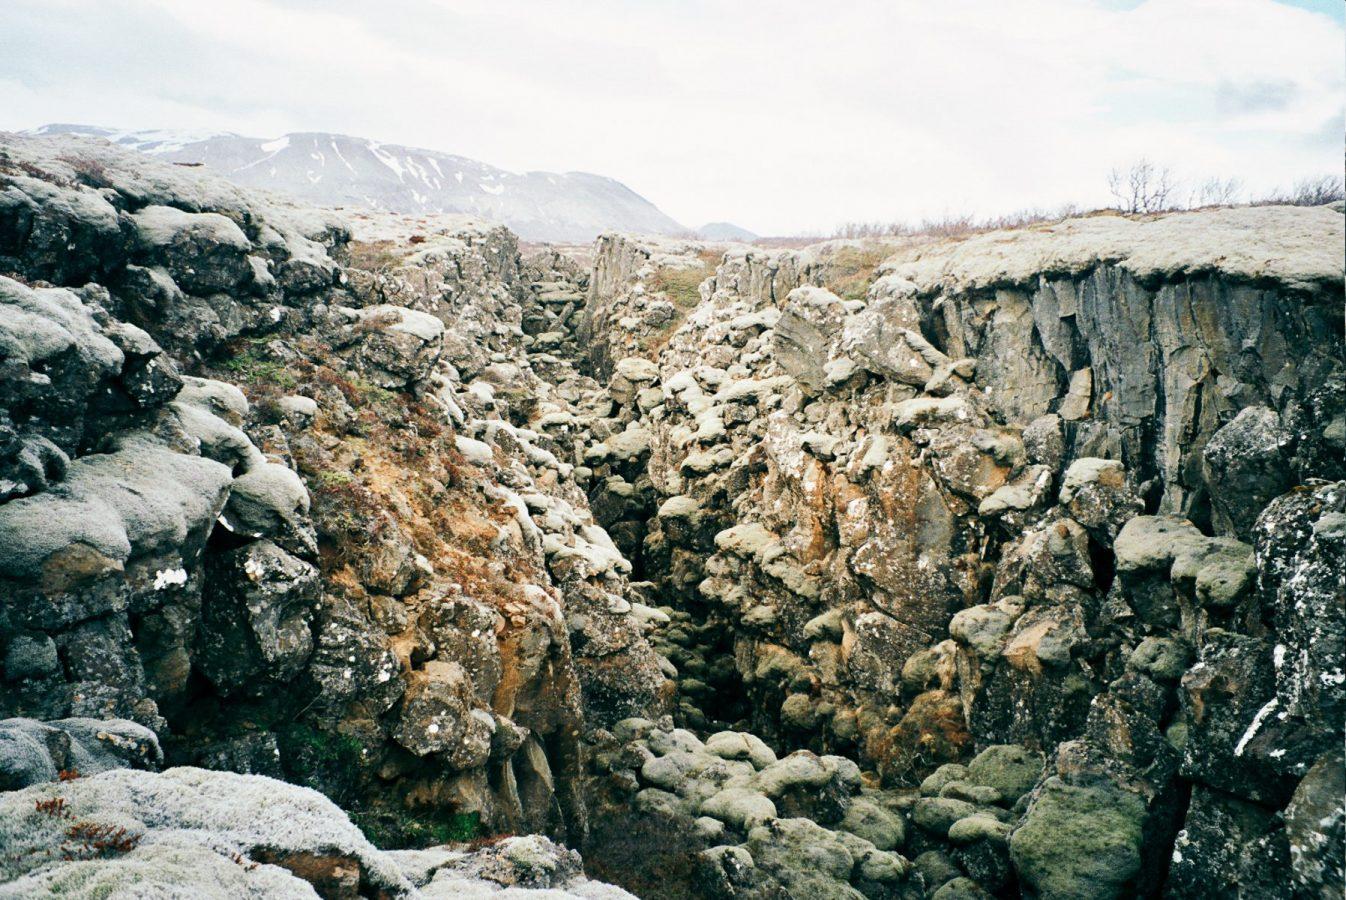 Thingvellir, Iceland photographed with Yashica T4 Zoom 35mm camera